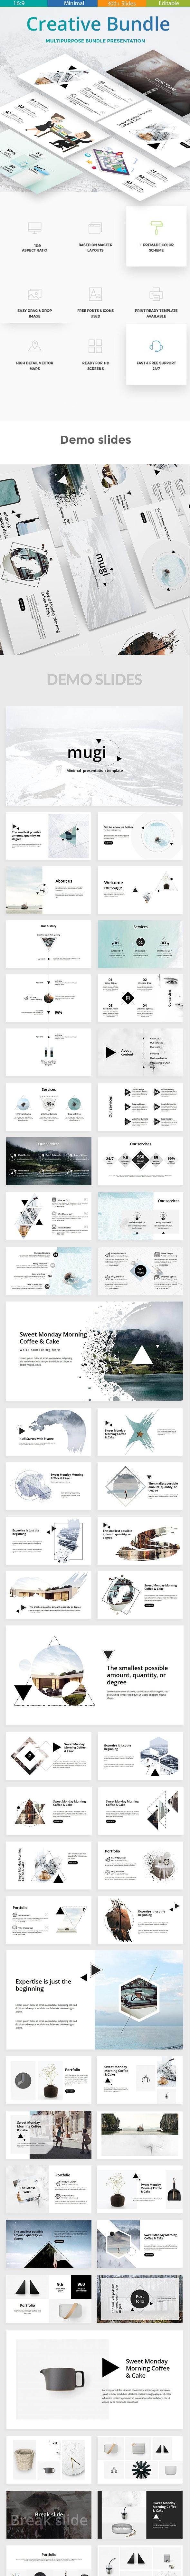 3 in 1 Creative Bundle Powerpoint Template - Creative PowerPoint Templates